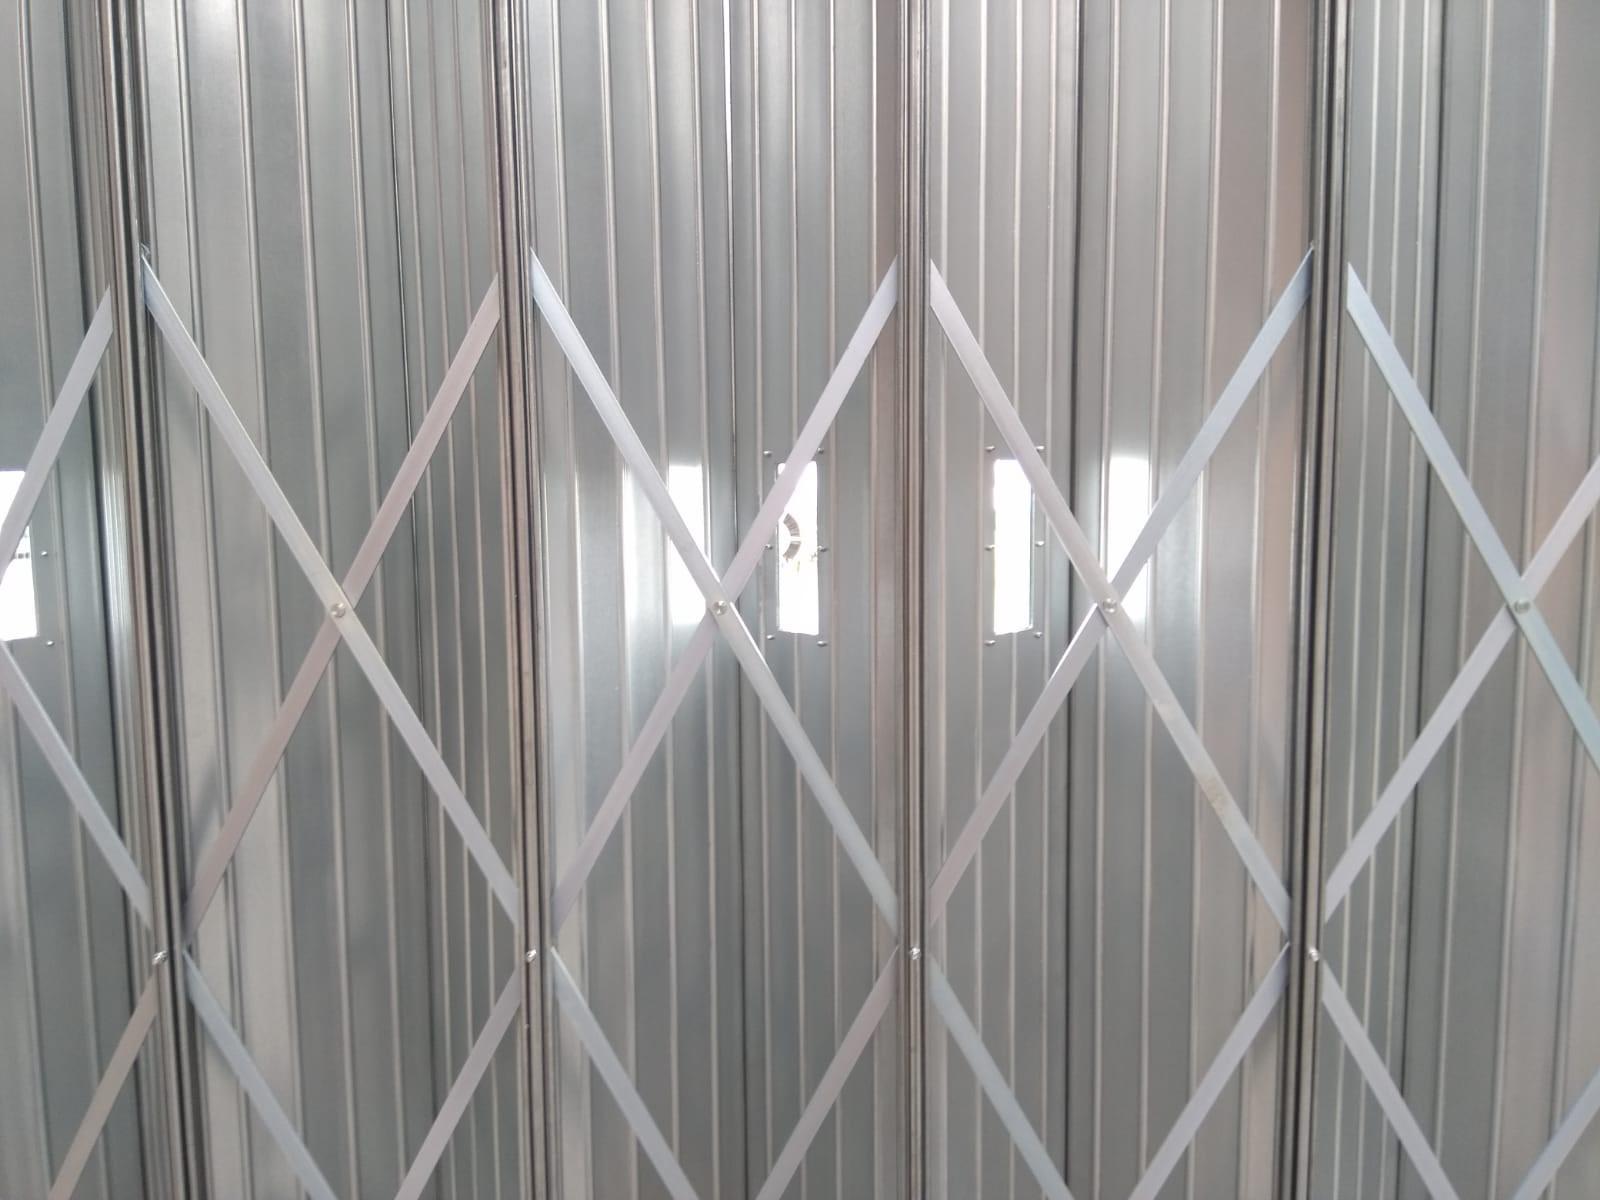 sliding-shutter-with-windows-3